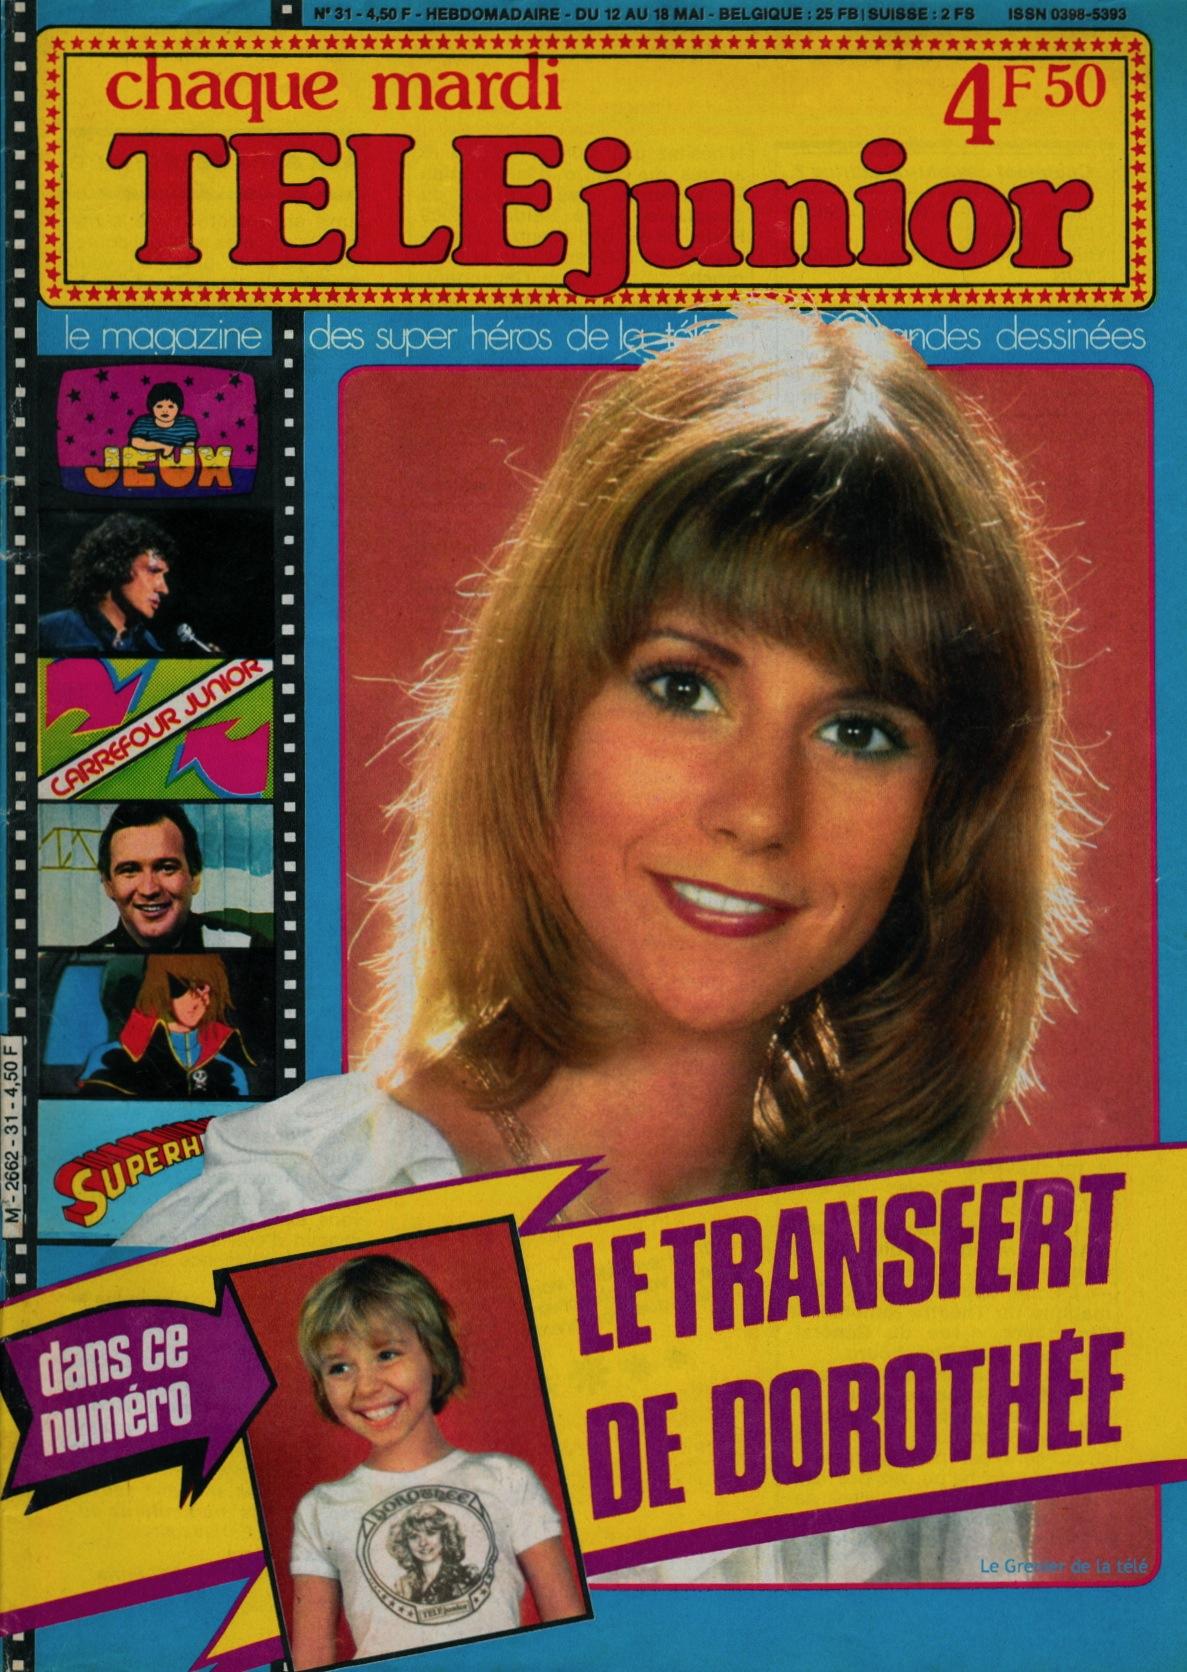 http://grenierdelatv.free.fr/dorotheefemmeorchestremai1981a.jpg